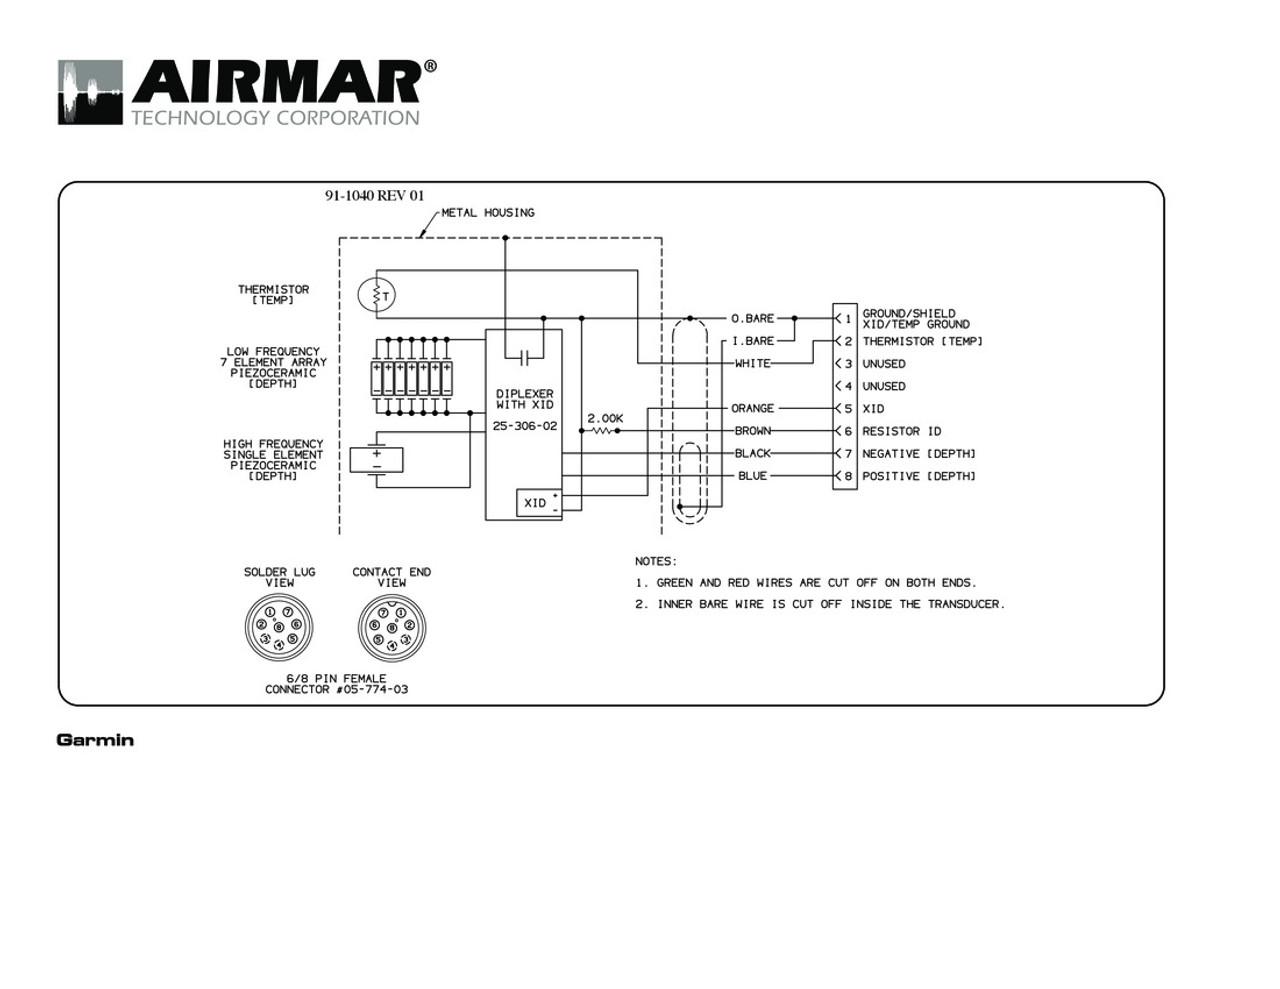 small resolution of uniden wire diagram schematic diagramuniden solara dsc wiring diagram wiring diagram simple wiring diagrams uniden solara